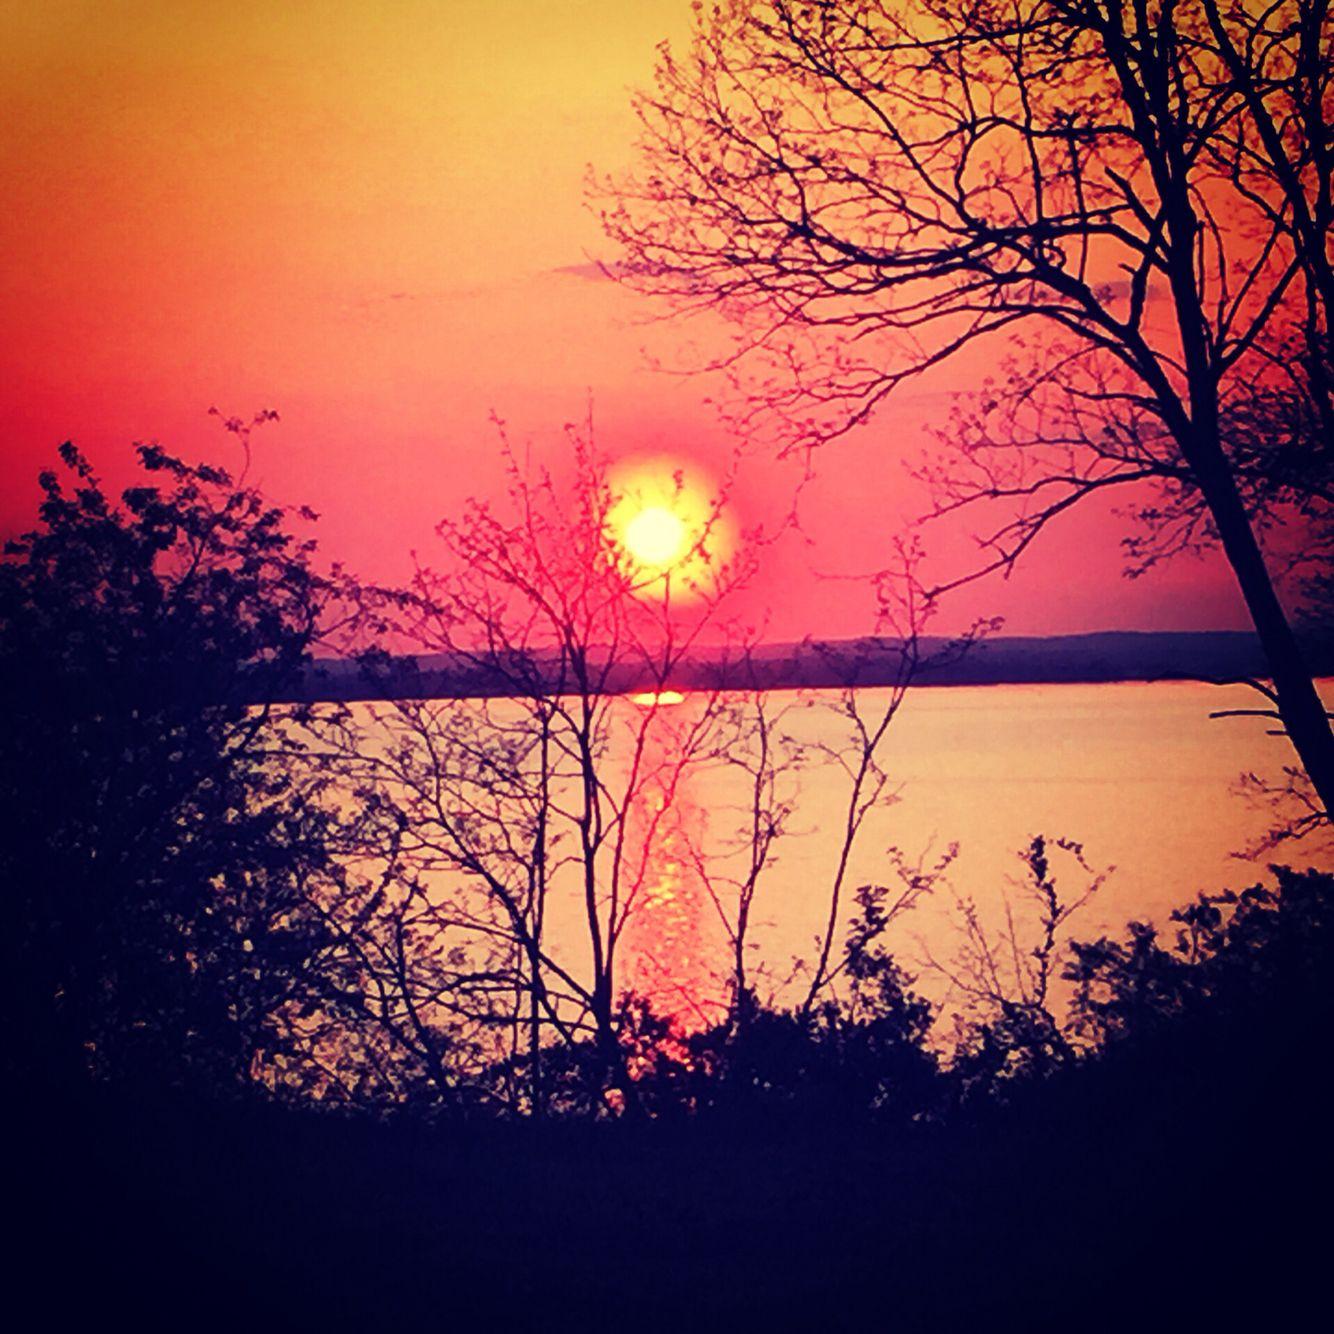 Sunset turkey point Maryland